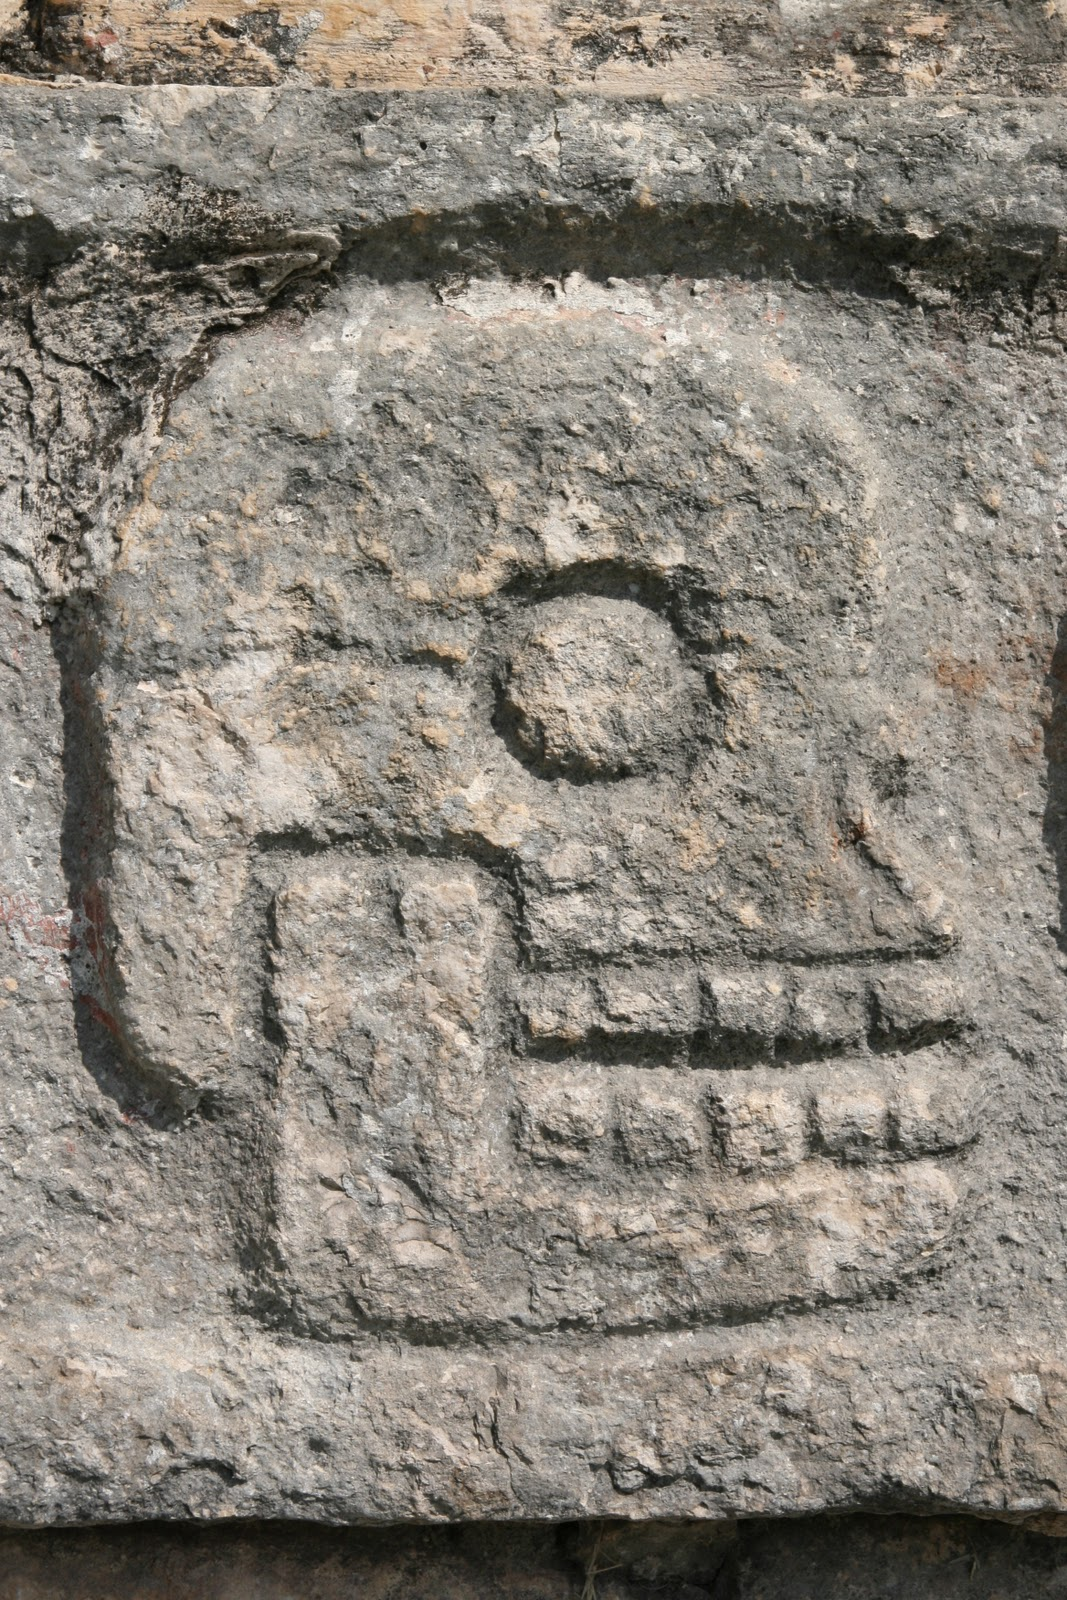 Michaels maya the mayan calendars symbols